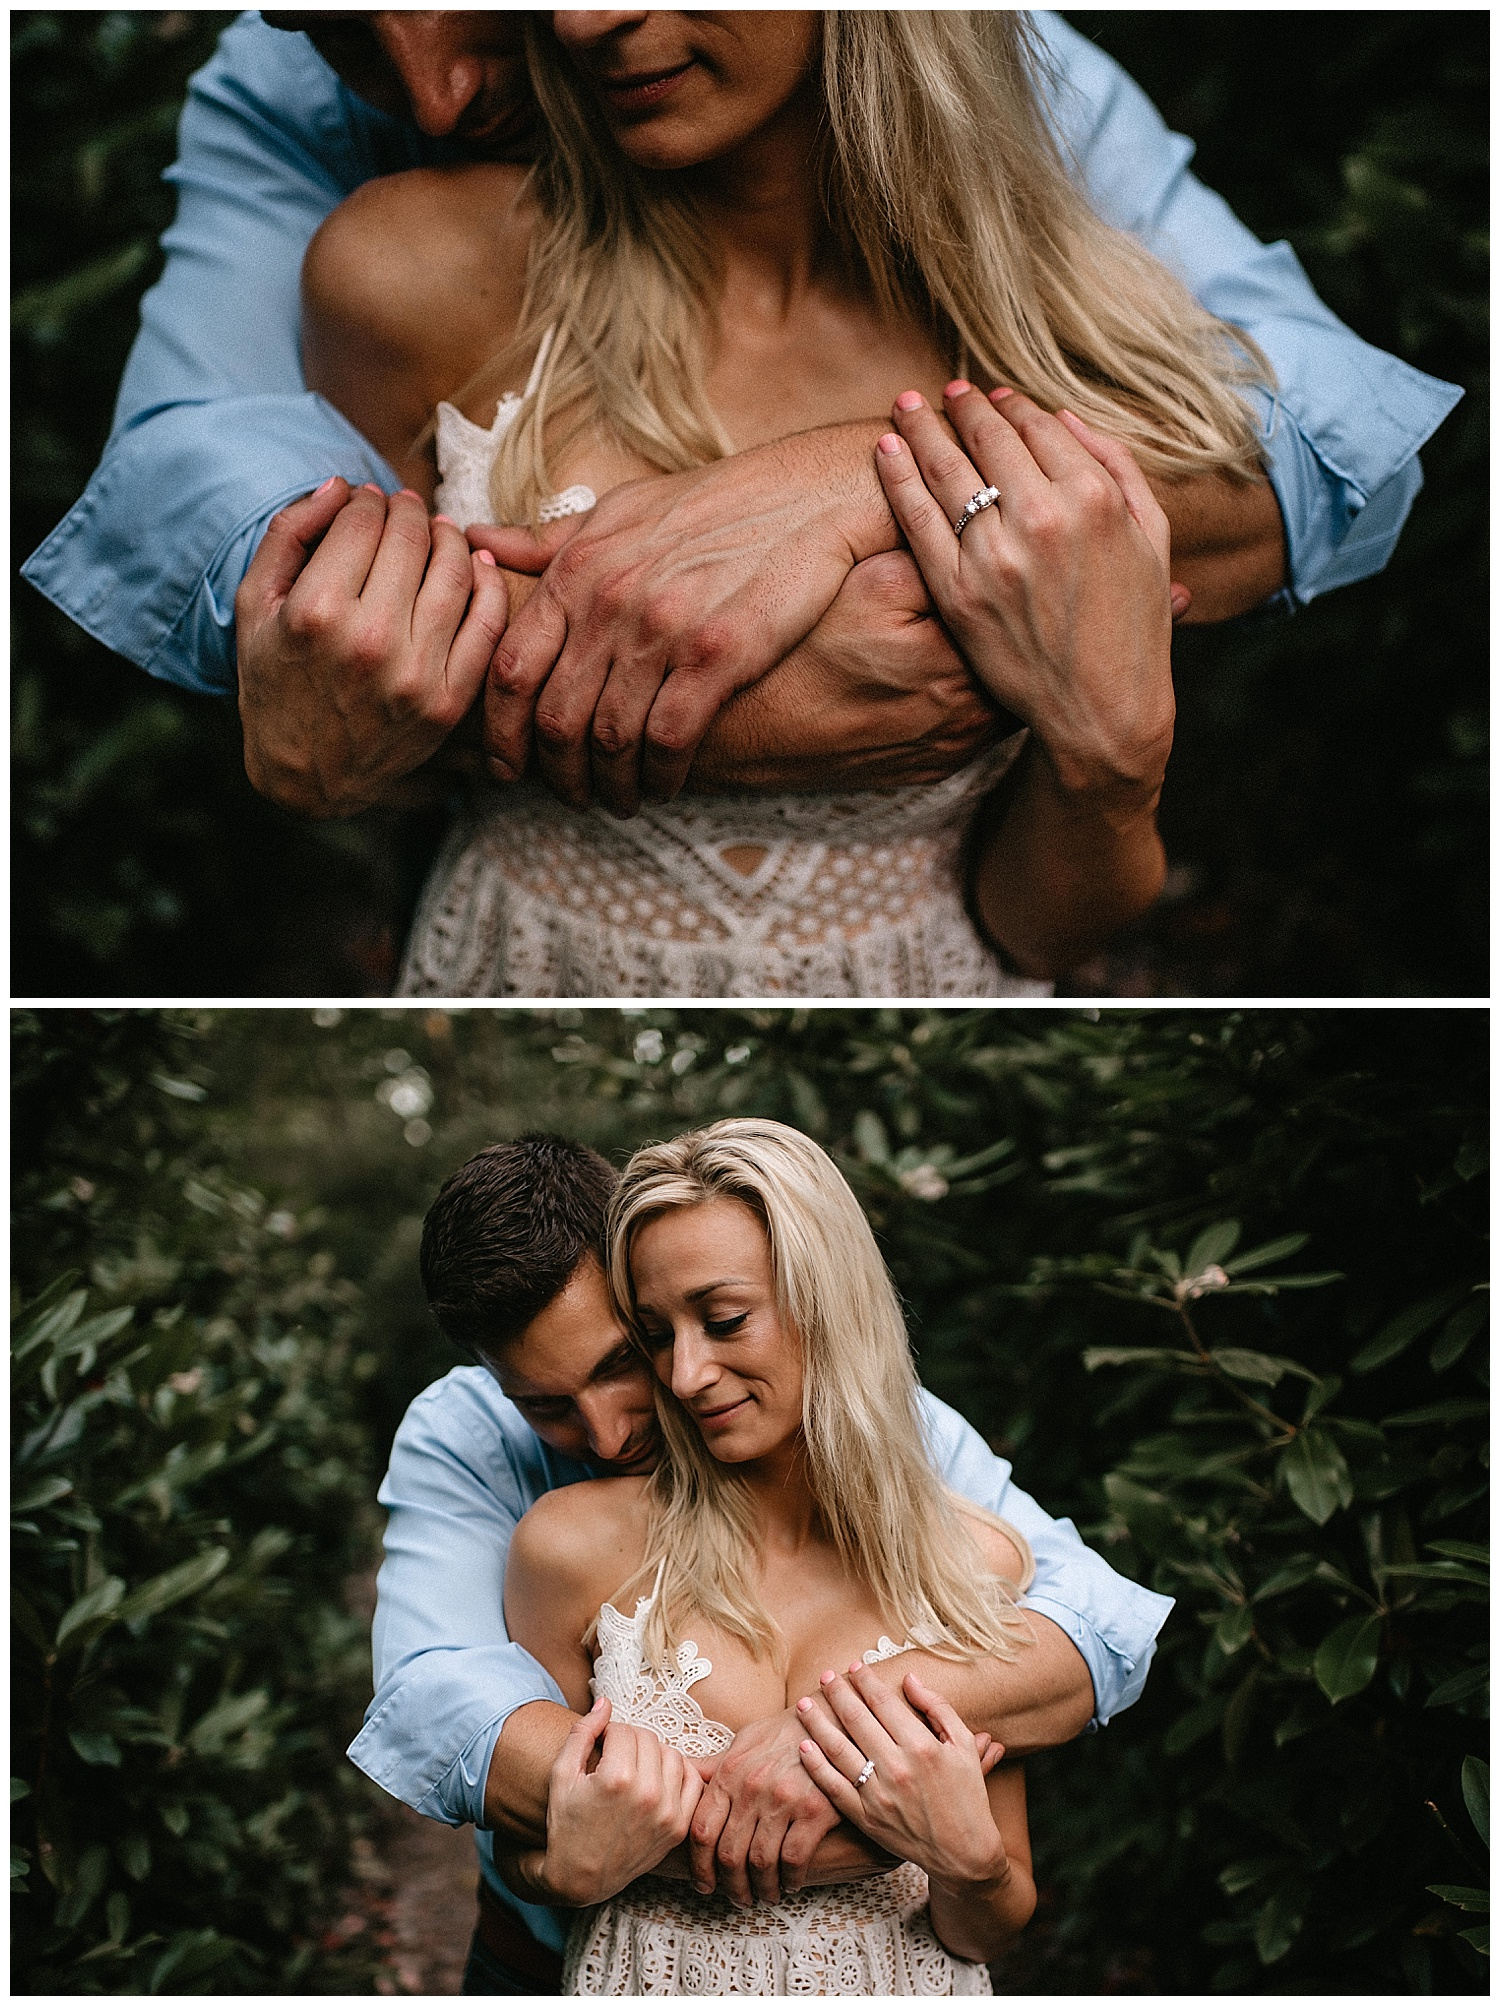 NEPA-Wedding-Engagement-Photographer-at-Hickory-Run-state-park_0025.jpg